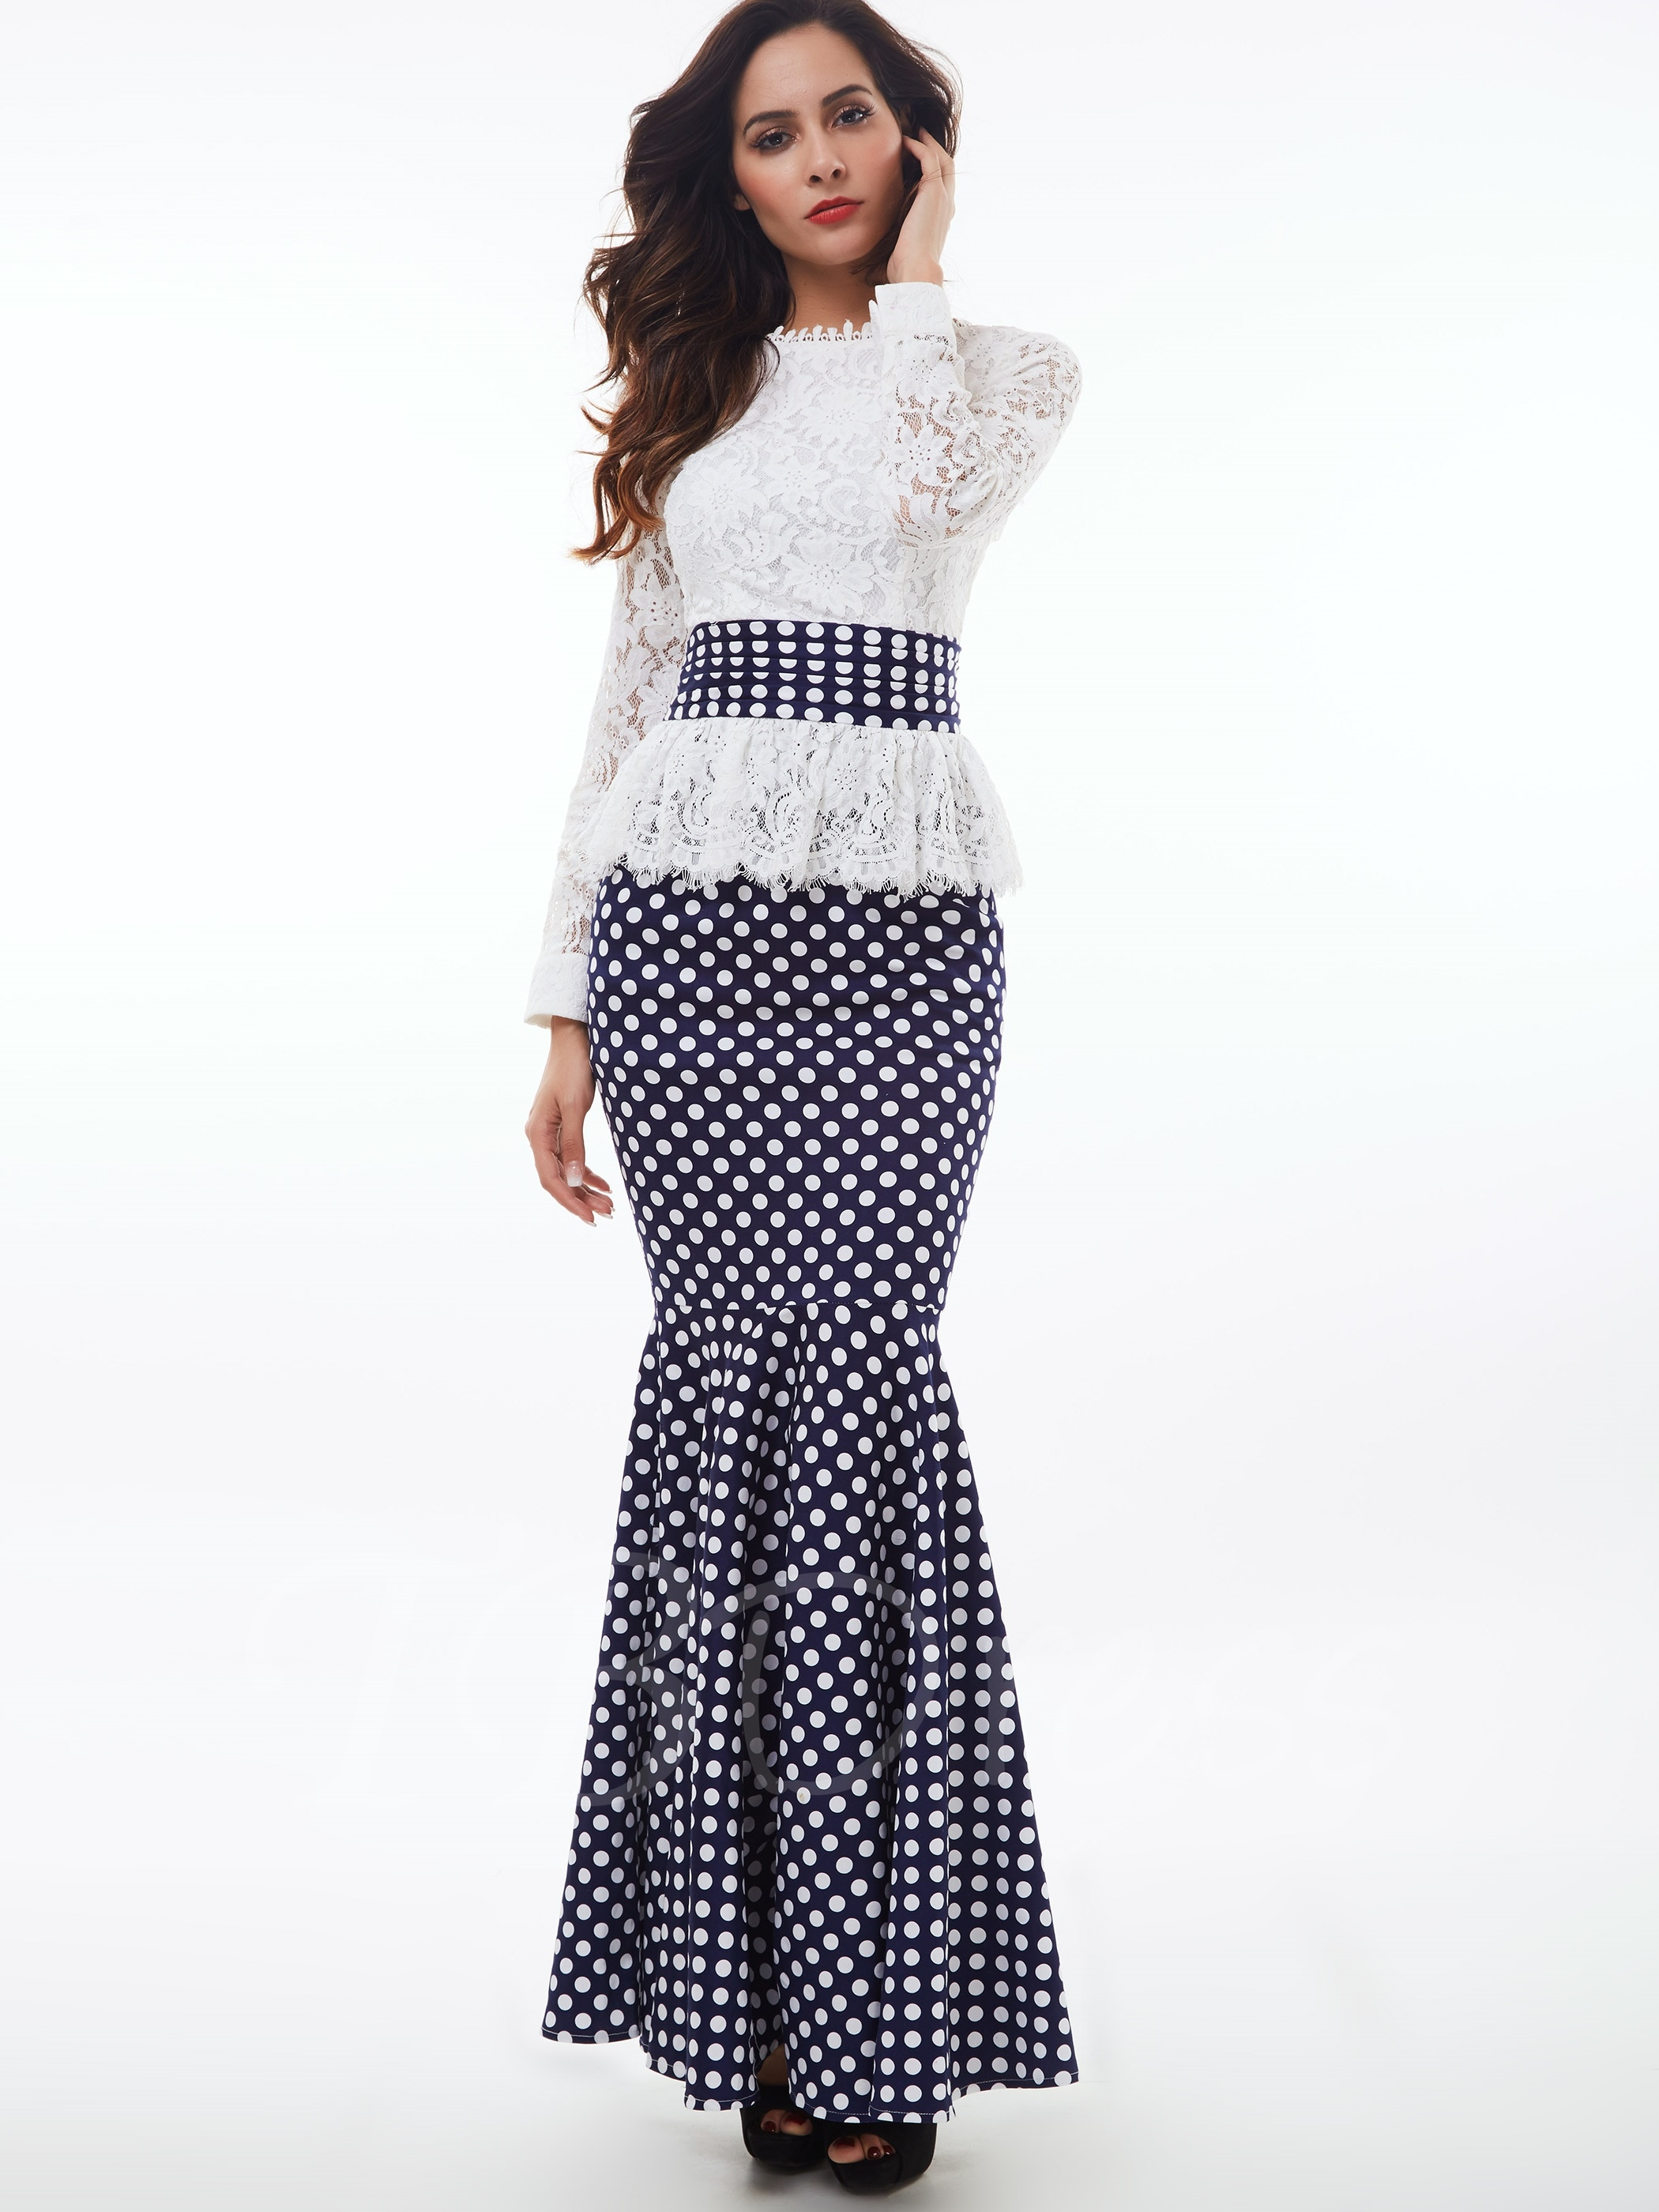 women dresses falbala stand collar lace polka dots womenu0027s maxi dress wbyxsrq